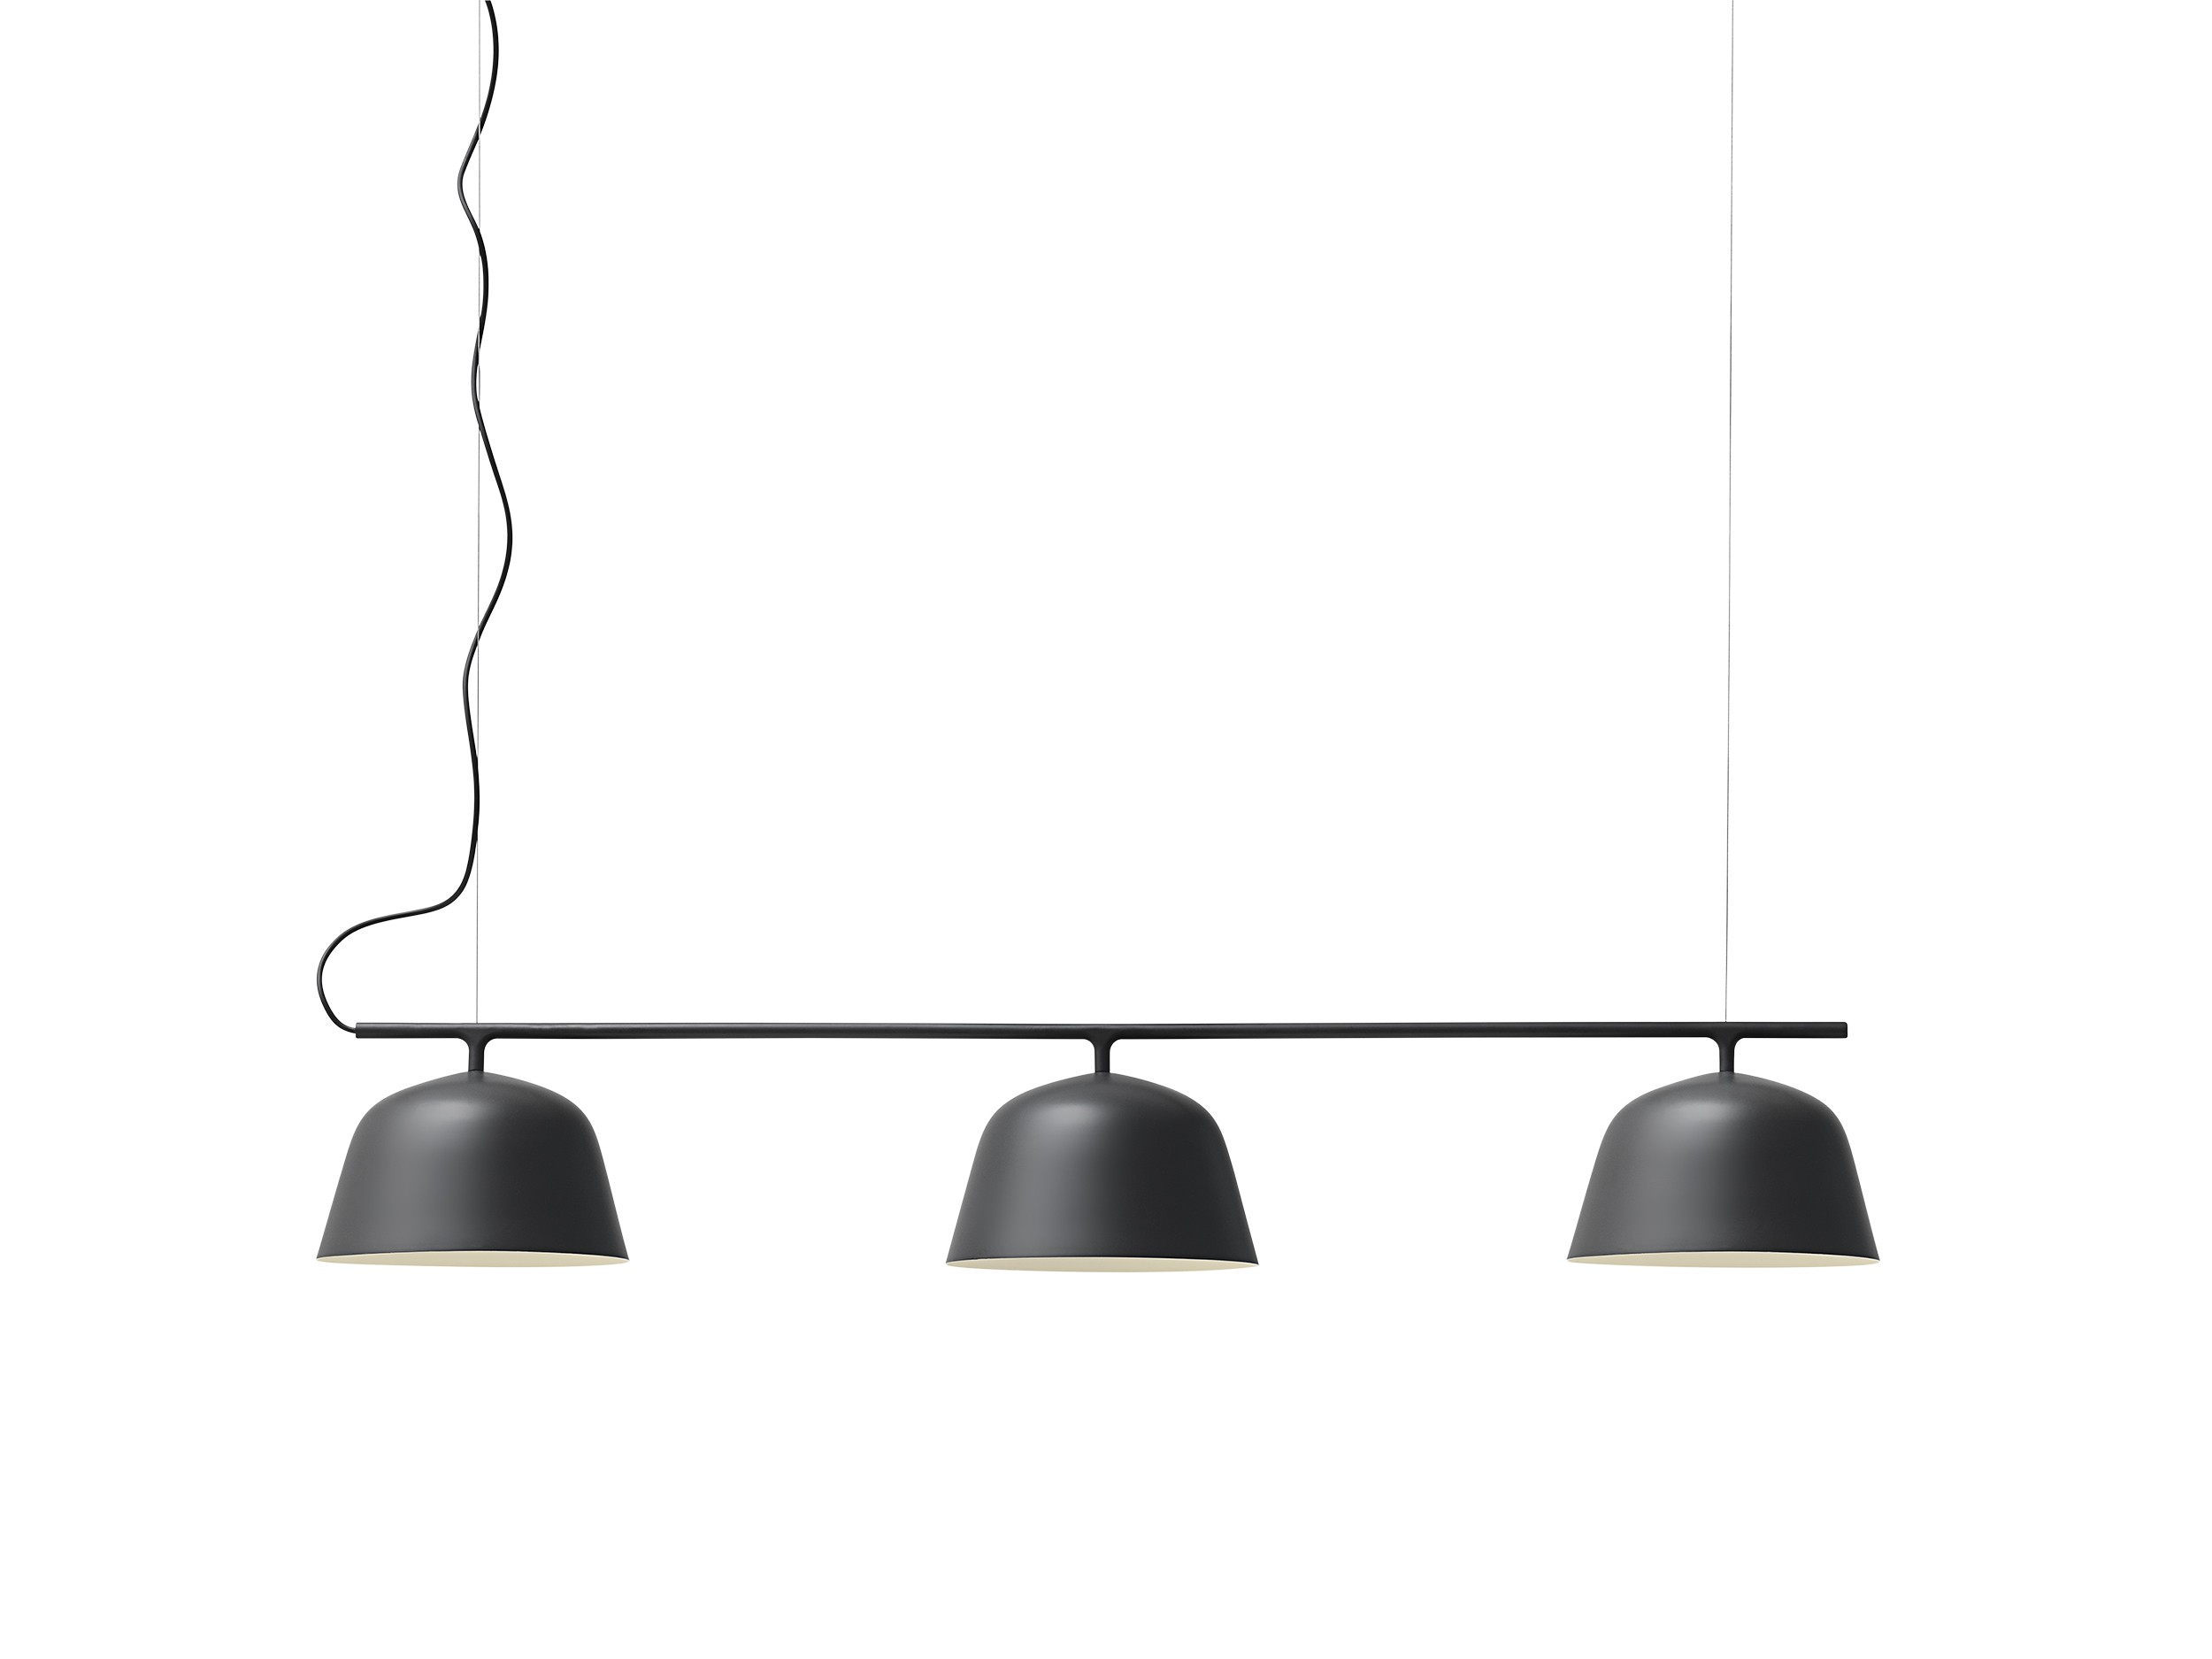 suspension ambit rail de muuto 3 coloris. Black Bedroom Furniture Sets. Home Design Ideas